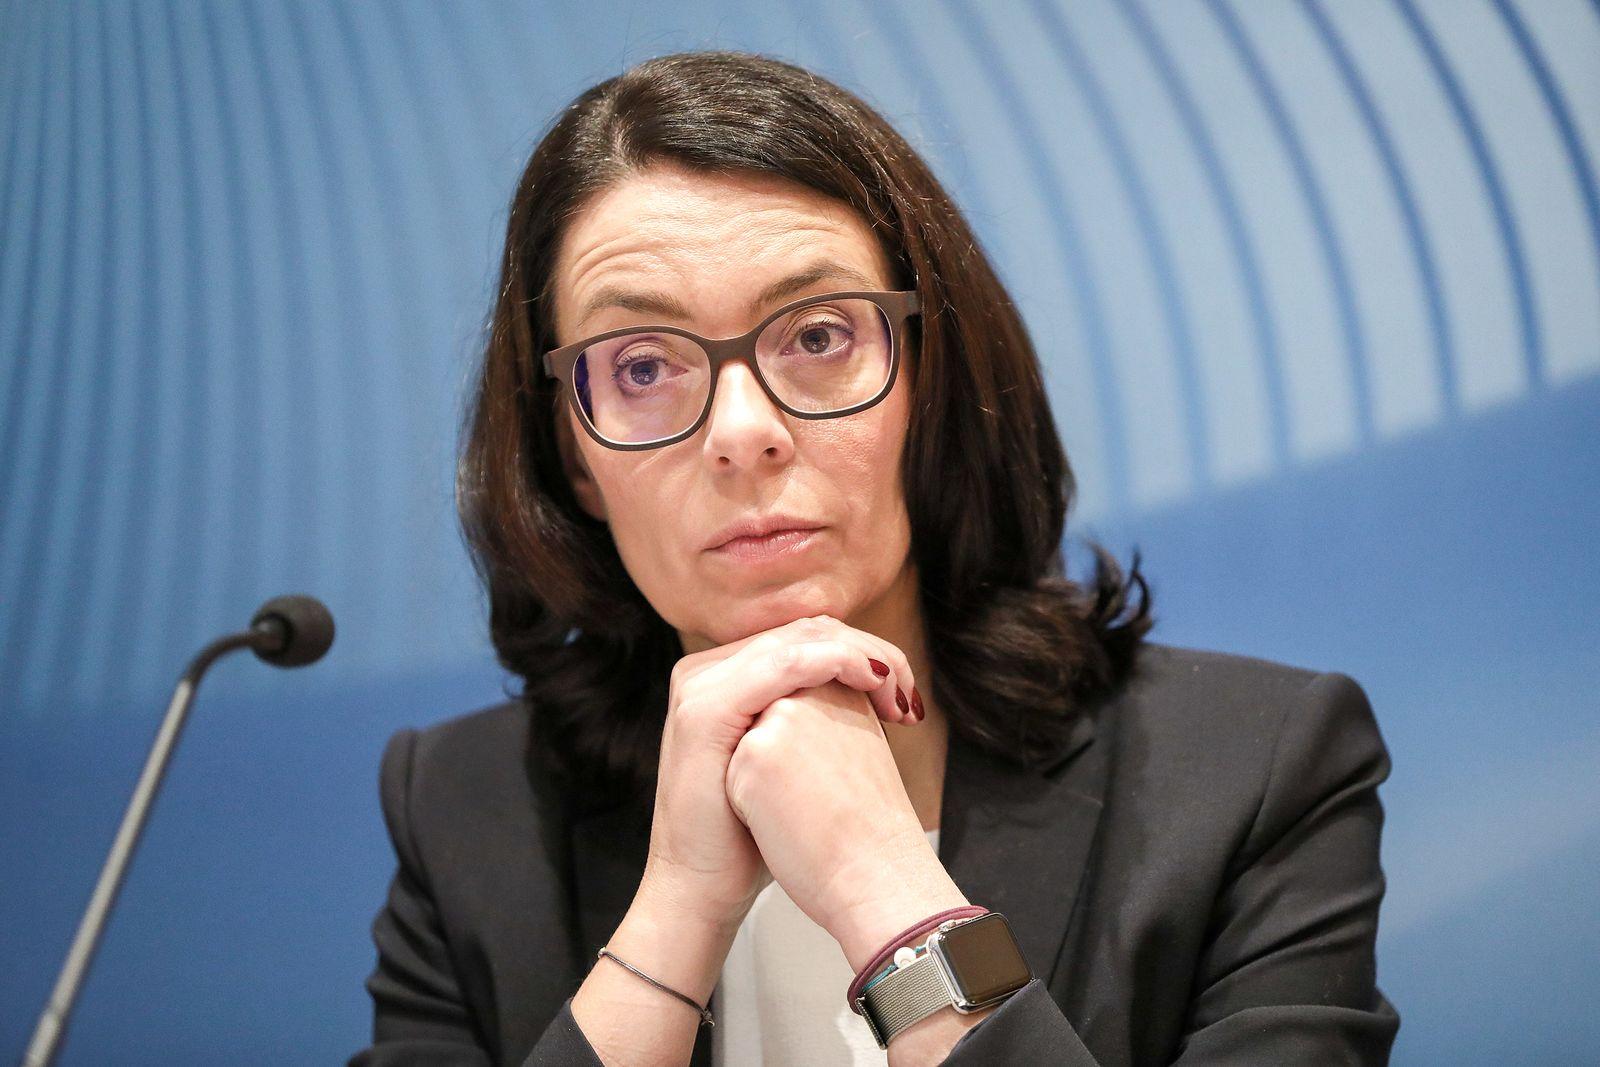 Nathalie Wappler